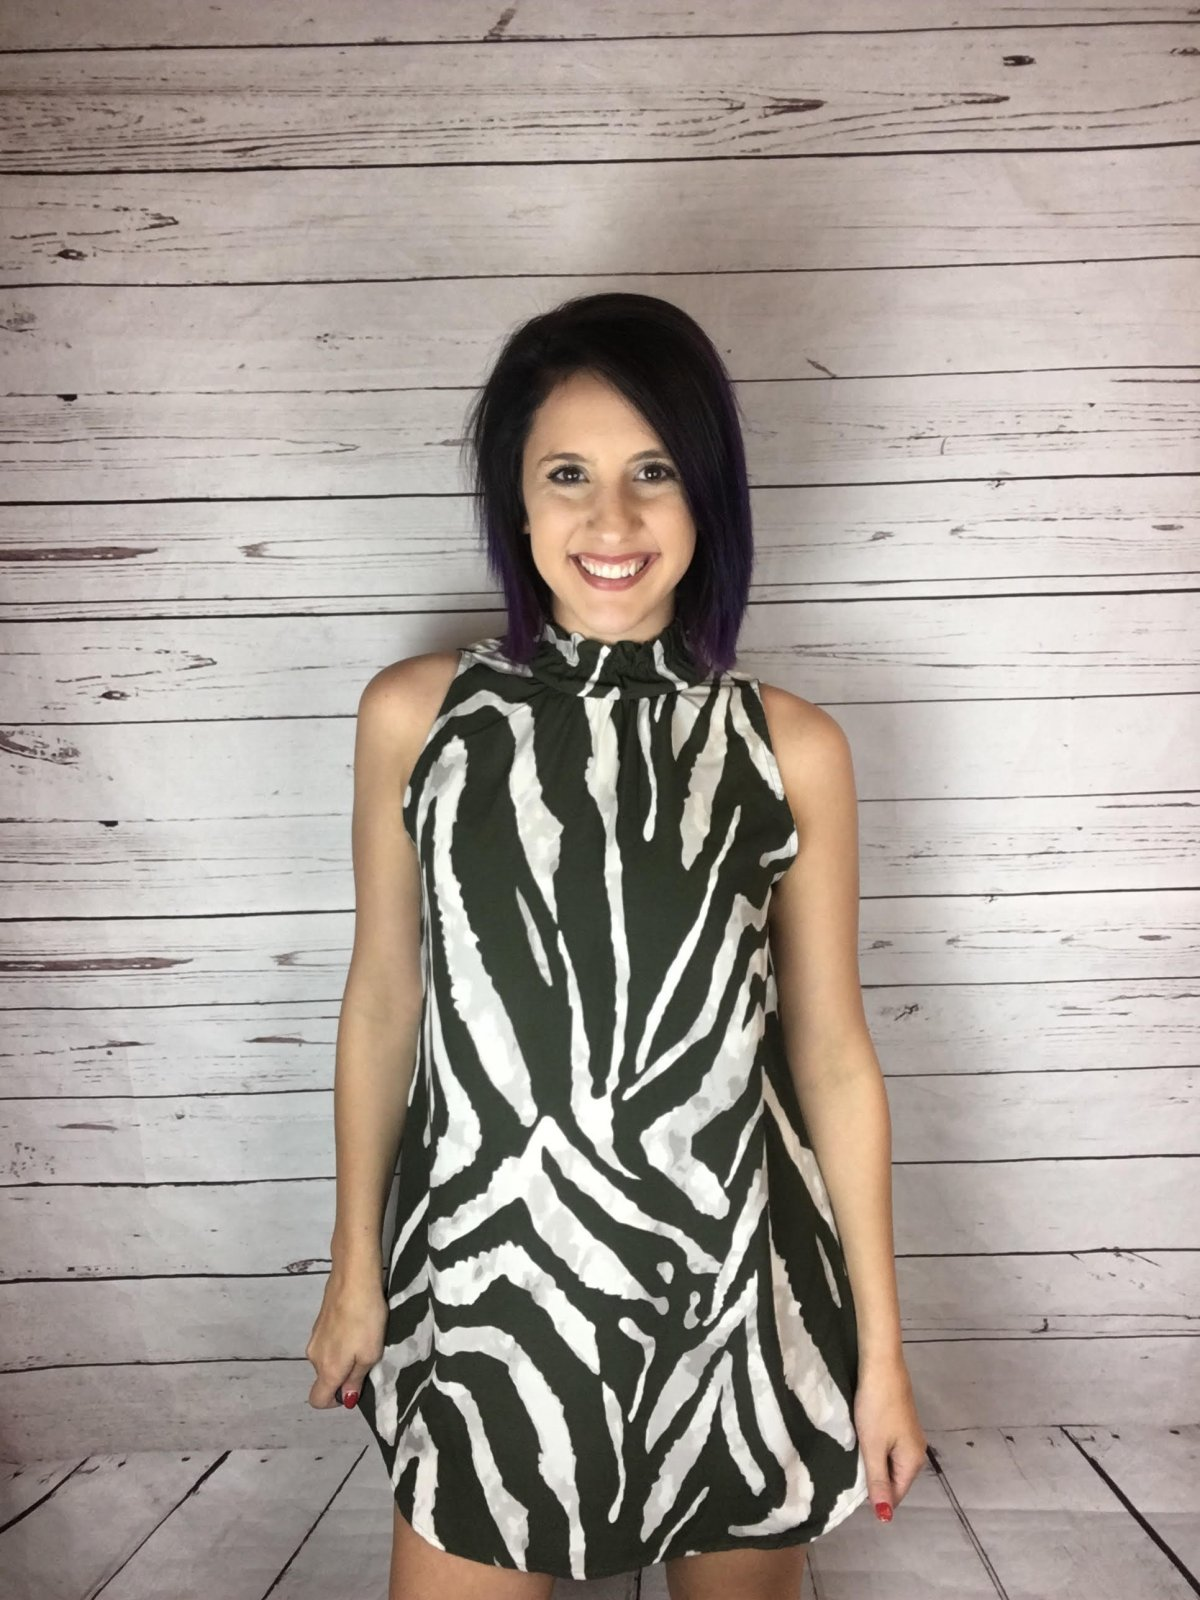 Puckered hi nk zebra print